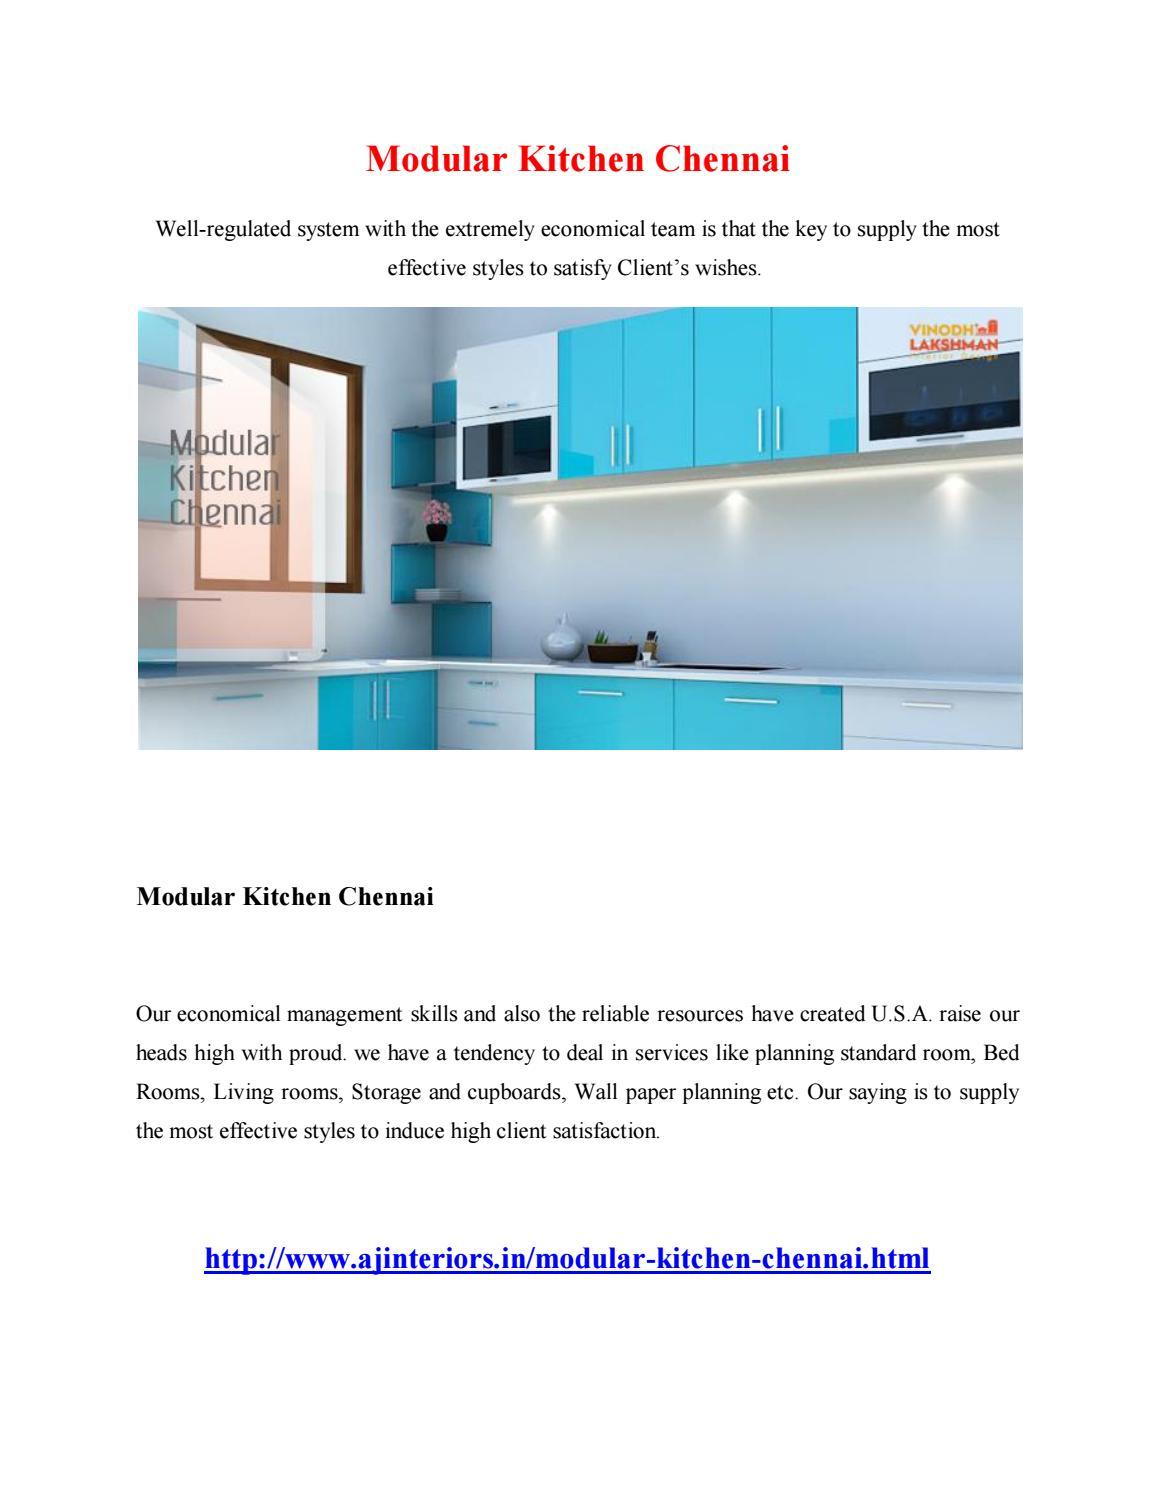 Modular kitchen chennai by saikrishram - Issuu